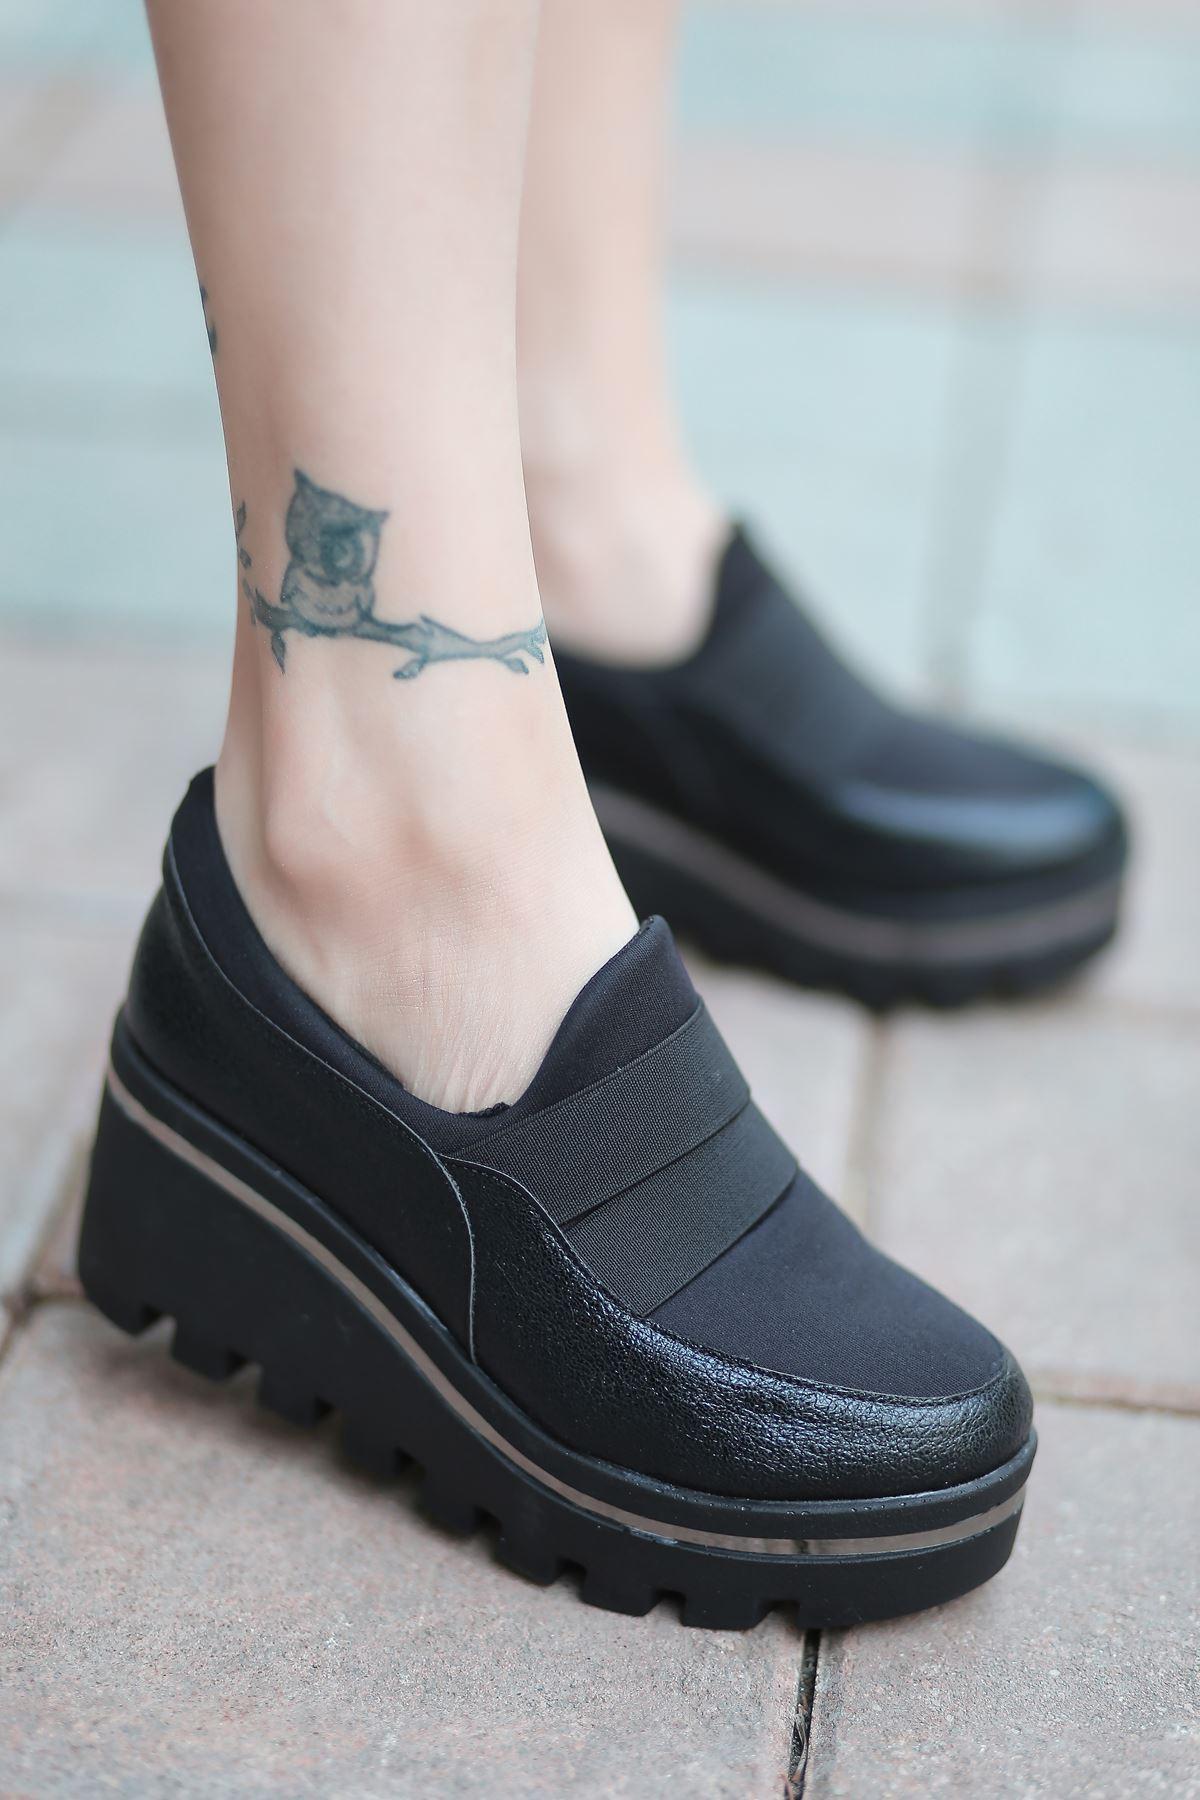 Bratz Lastik Detay Dolgu Topuk Ayakkabı Siyah